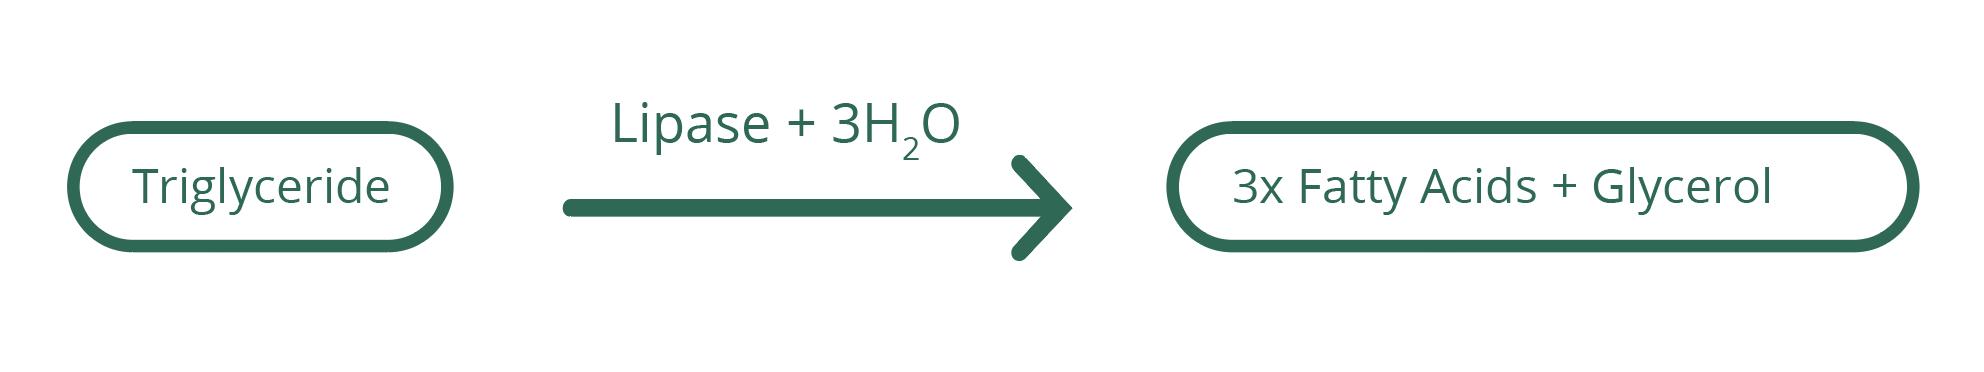 bio-p-cel-y11-12-3-1s.png